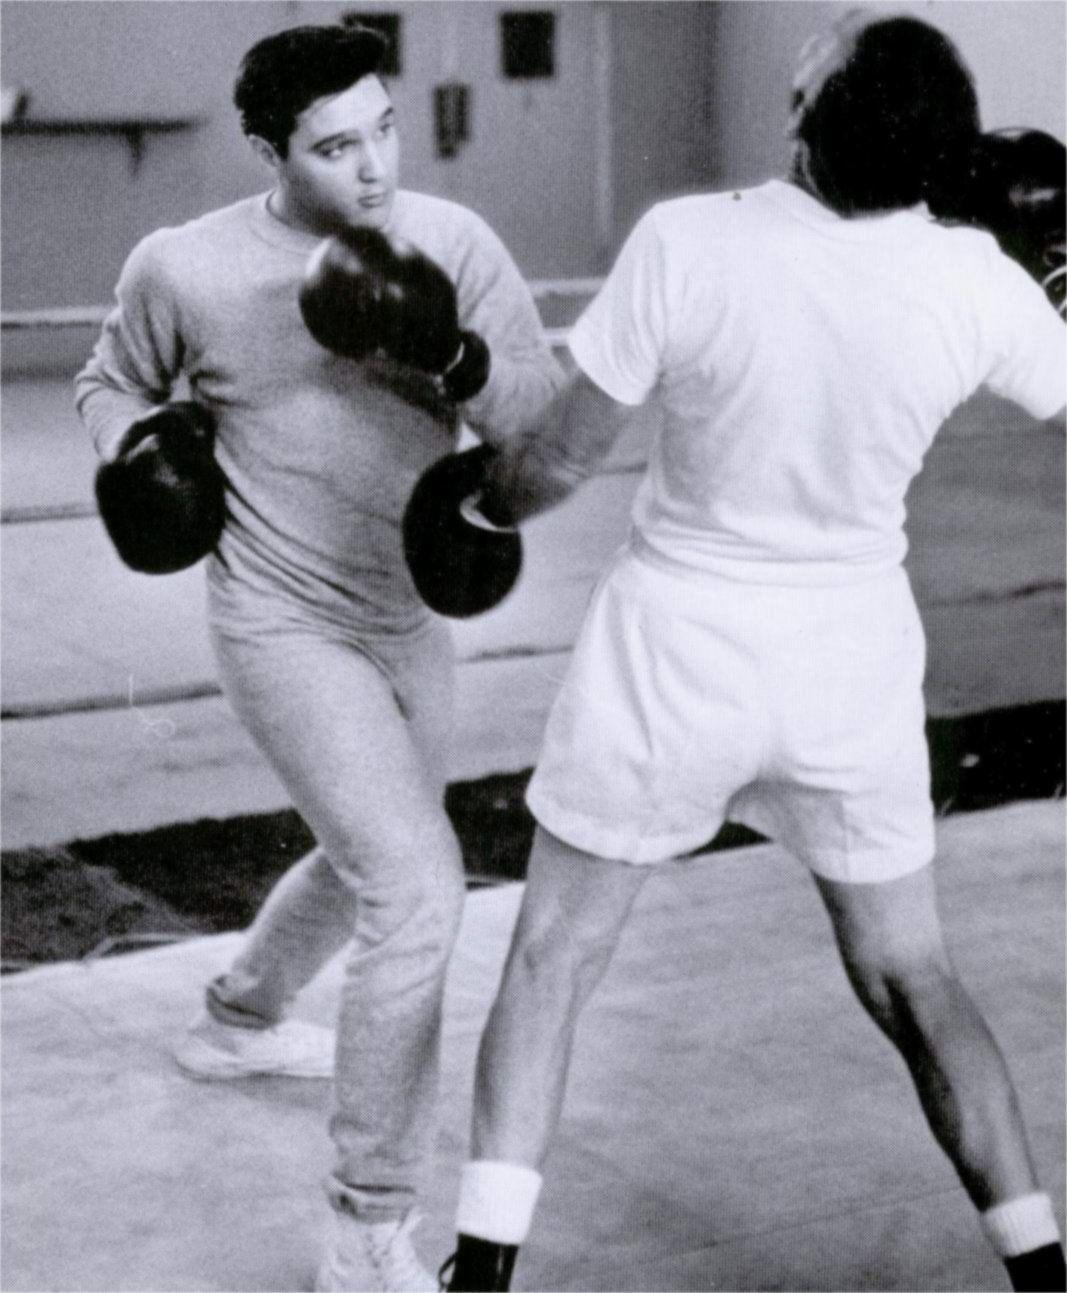 Elvis Training On The 'Kid Galahad' Set In Fall 1961. The